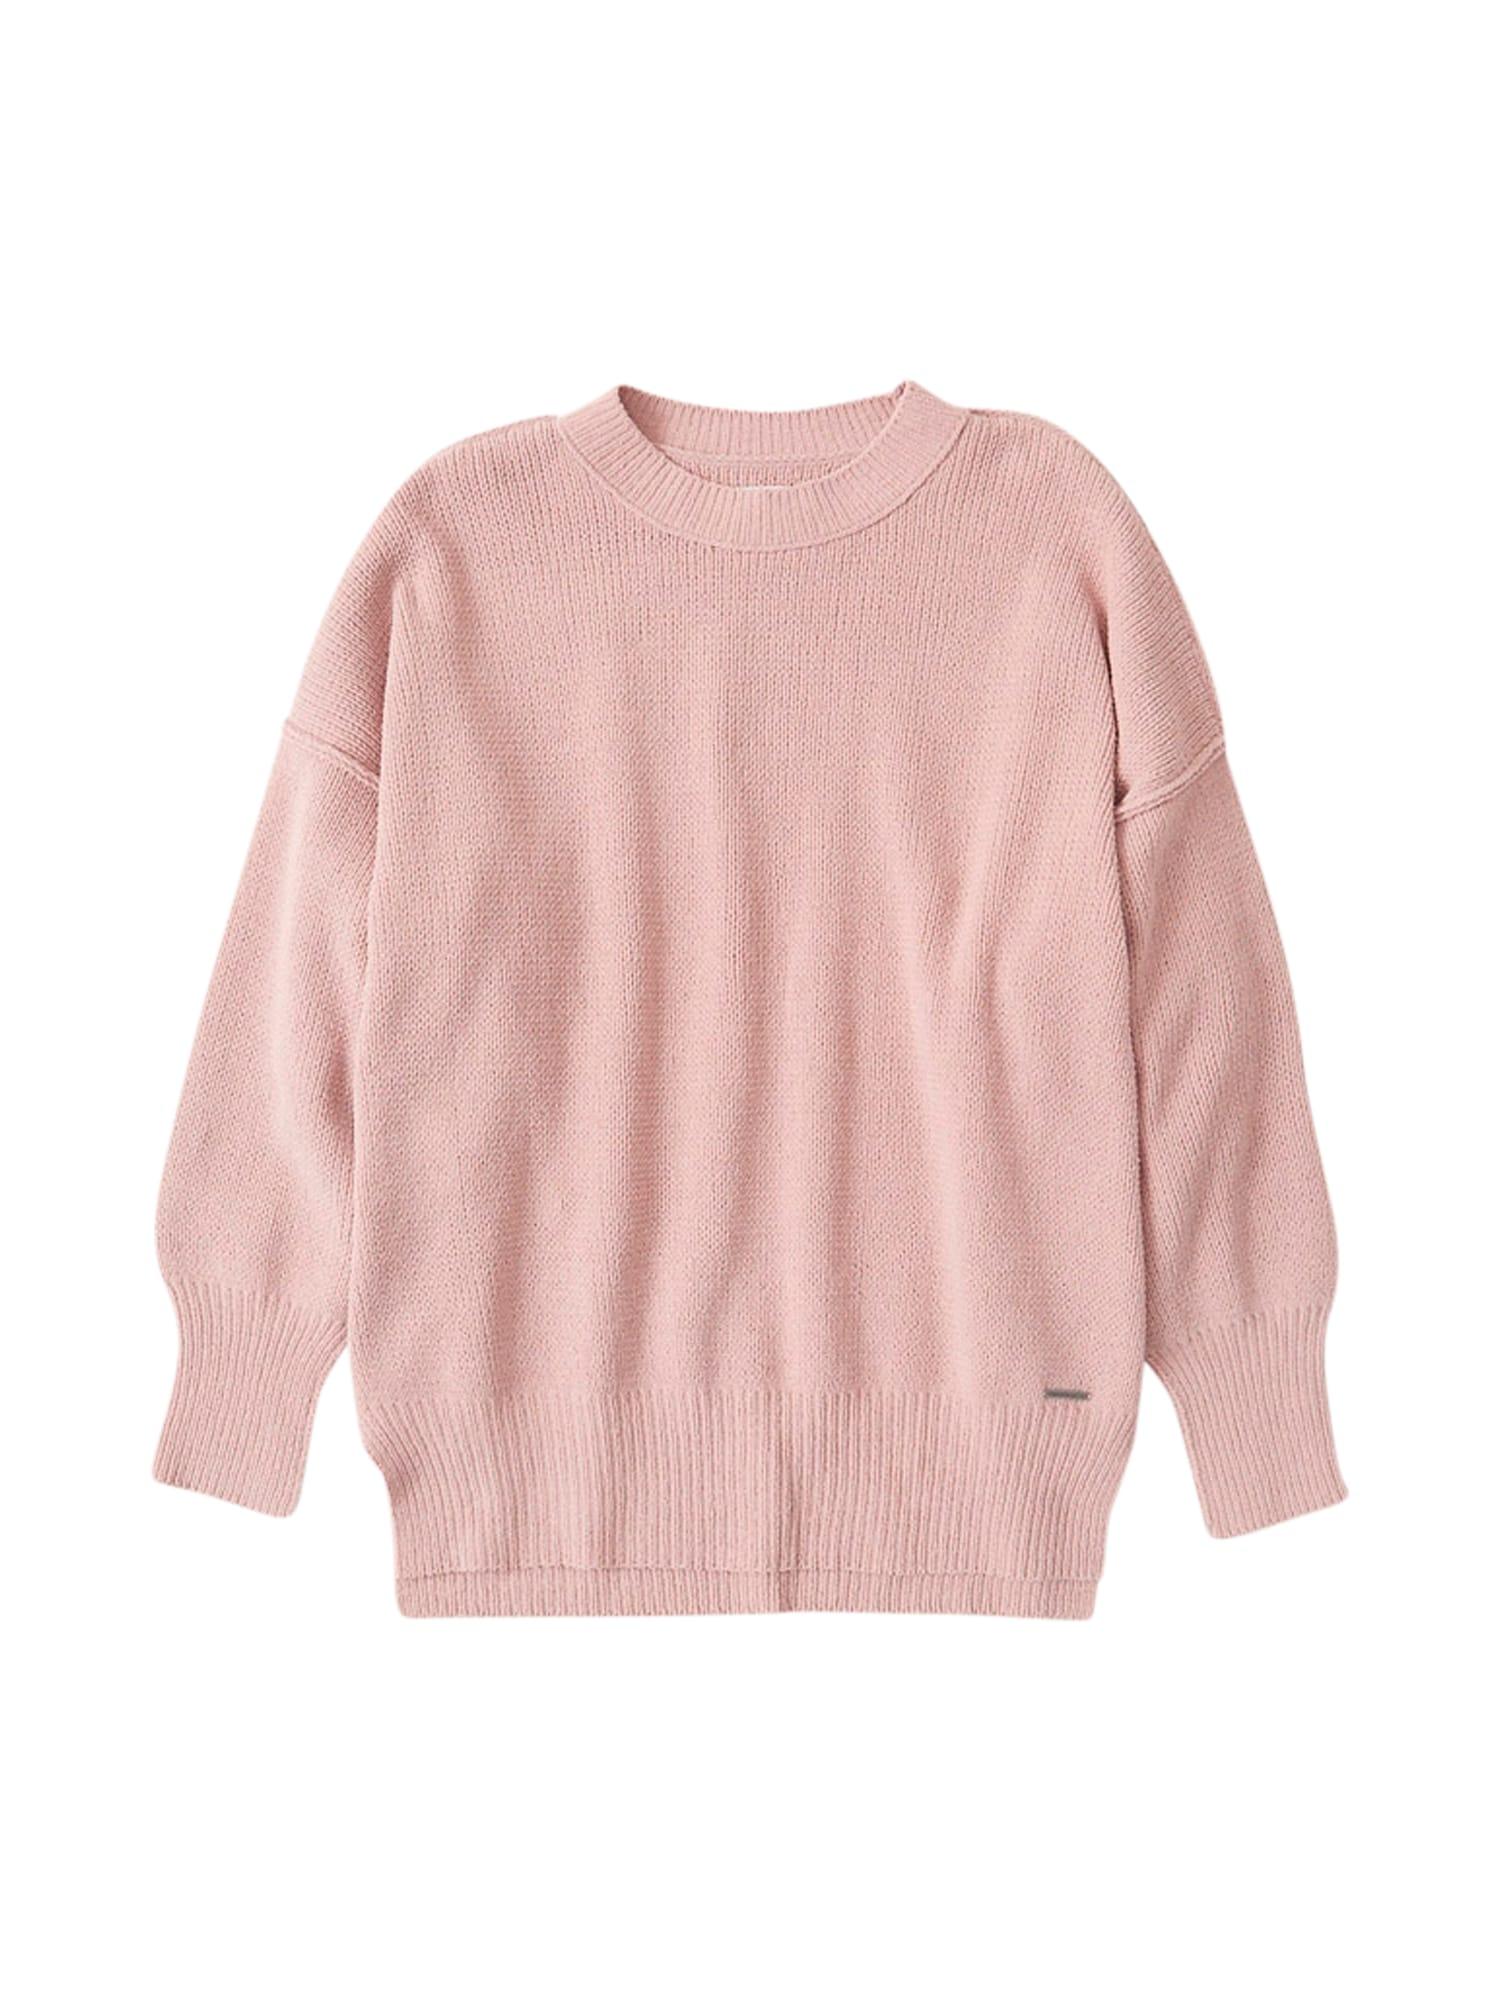 Abercrombie & Fitch Megztinis rožinė